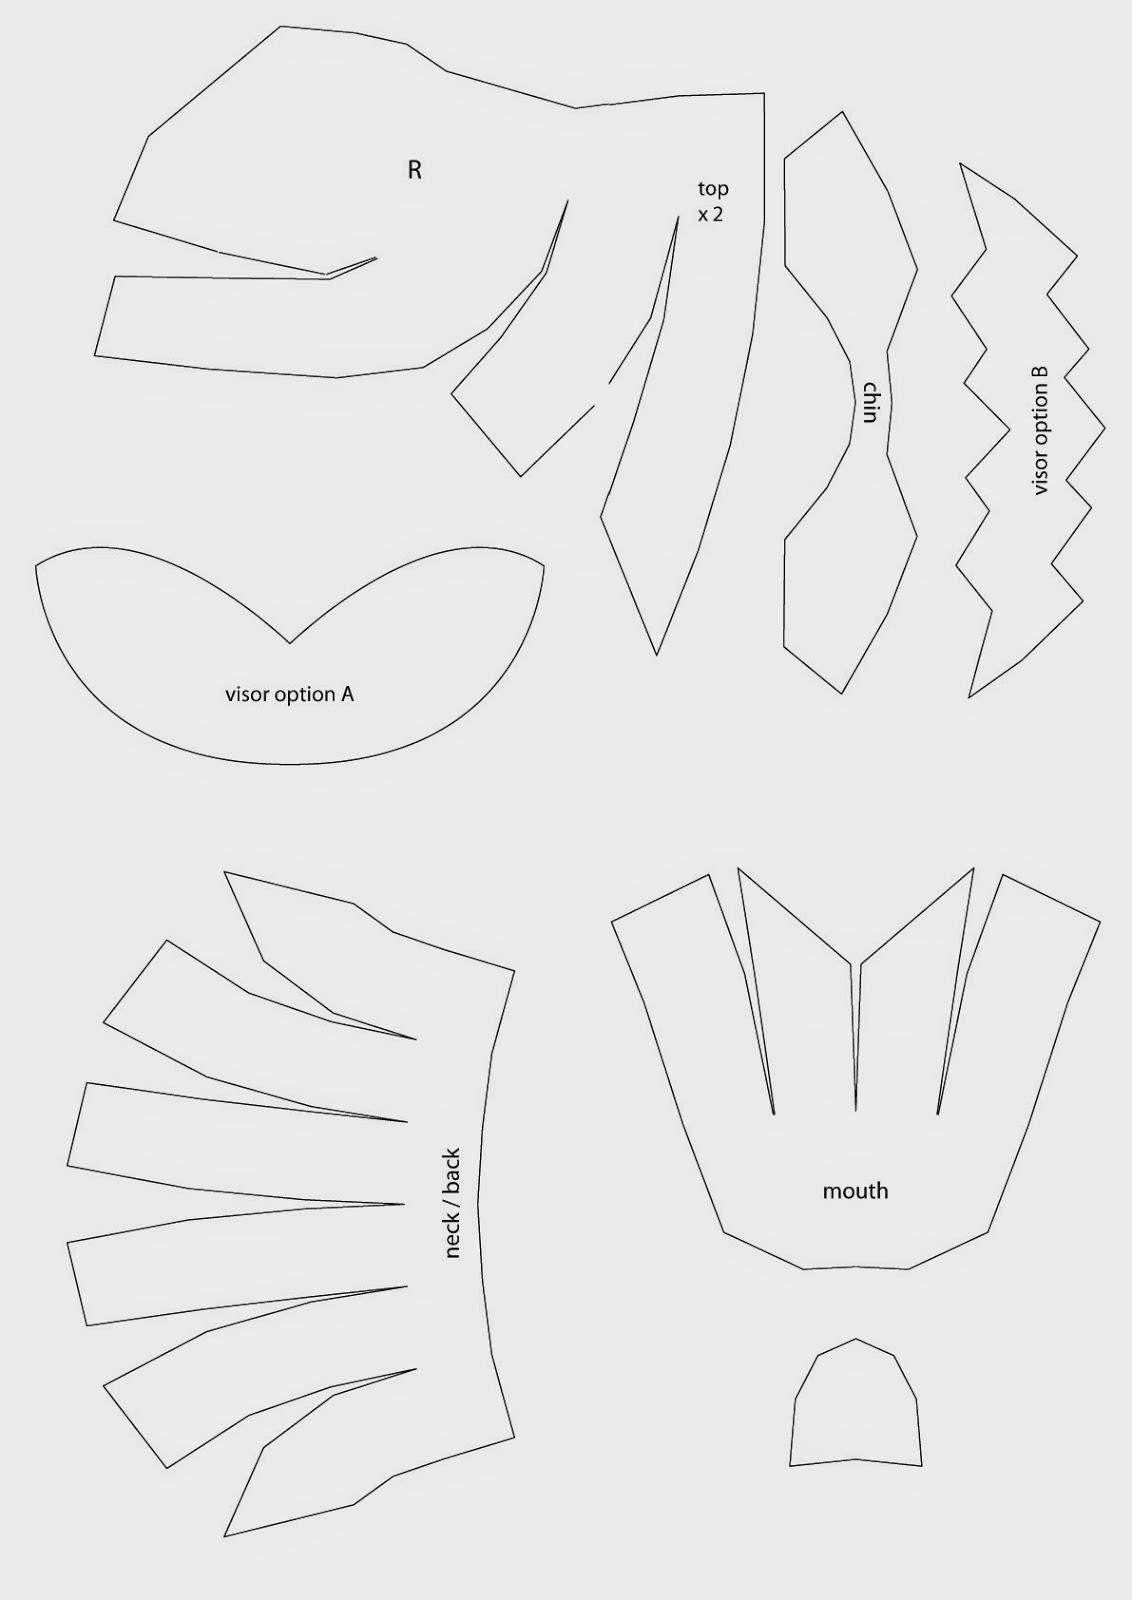 Dali Lomo Power Rangers Helmet Diy With New Template